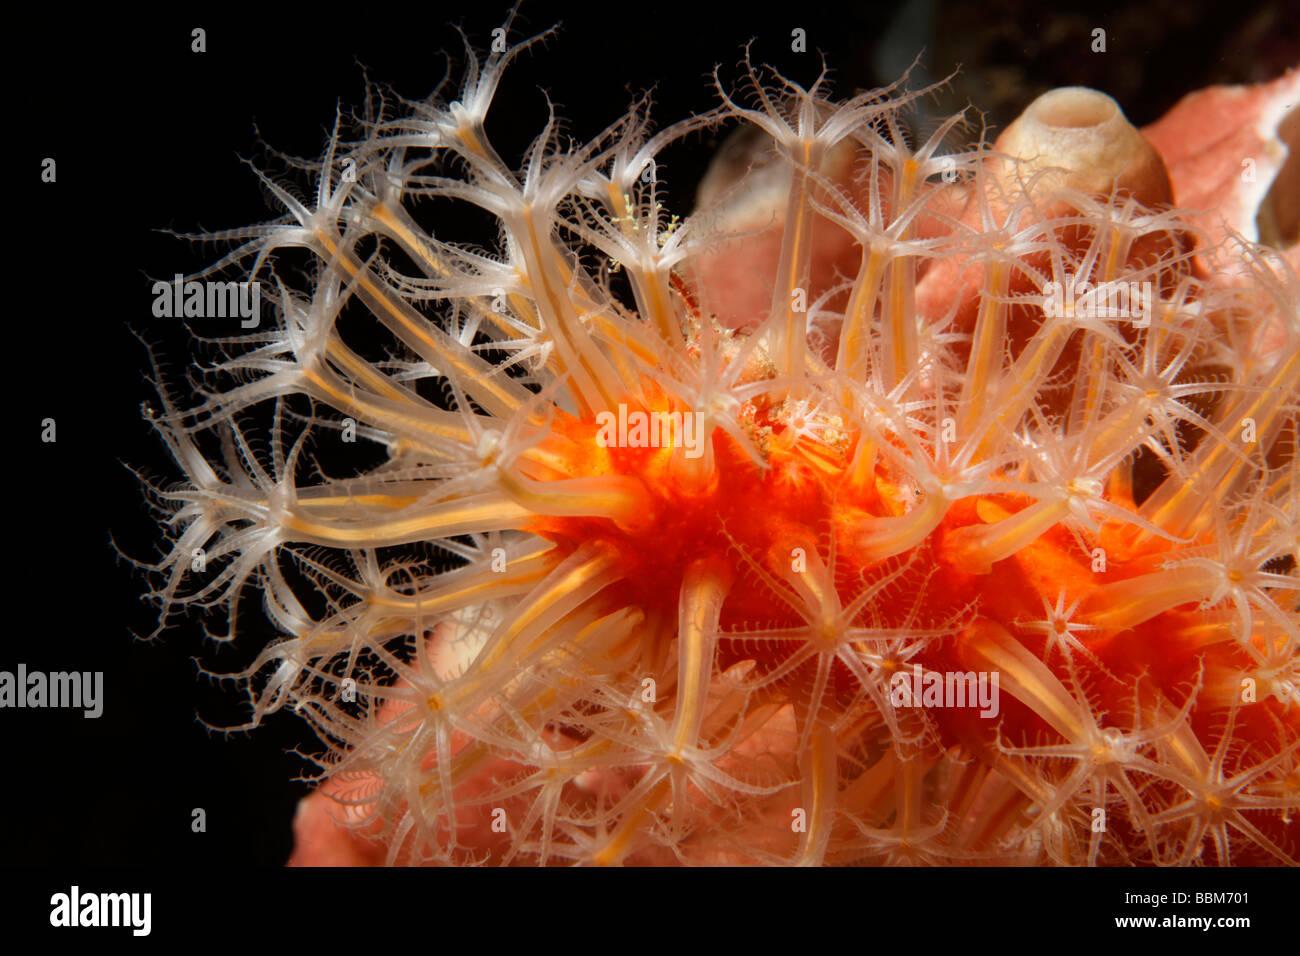 Veretillum weiche Koralle (Veretillum SP.) mit Polypen, Gangga Island, Inseln Bangka, Nord-Sulawesi, Indonesien, Stockbild